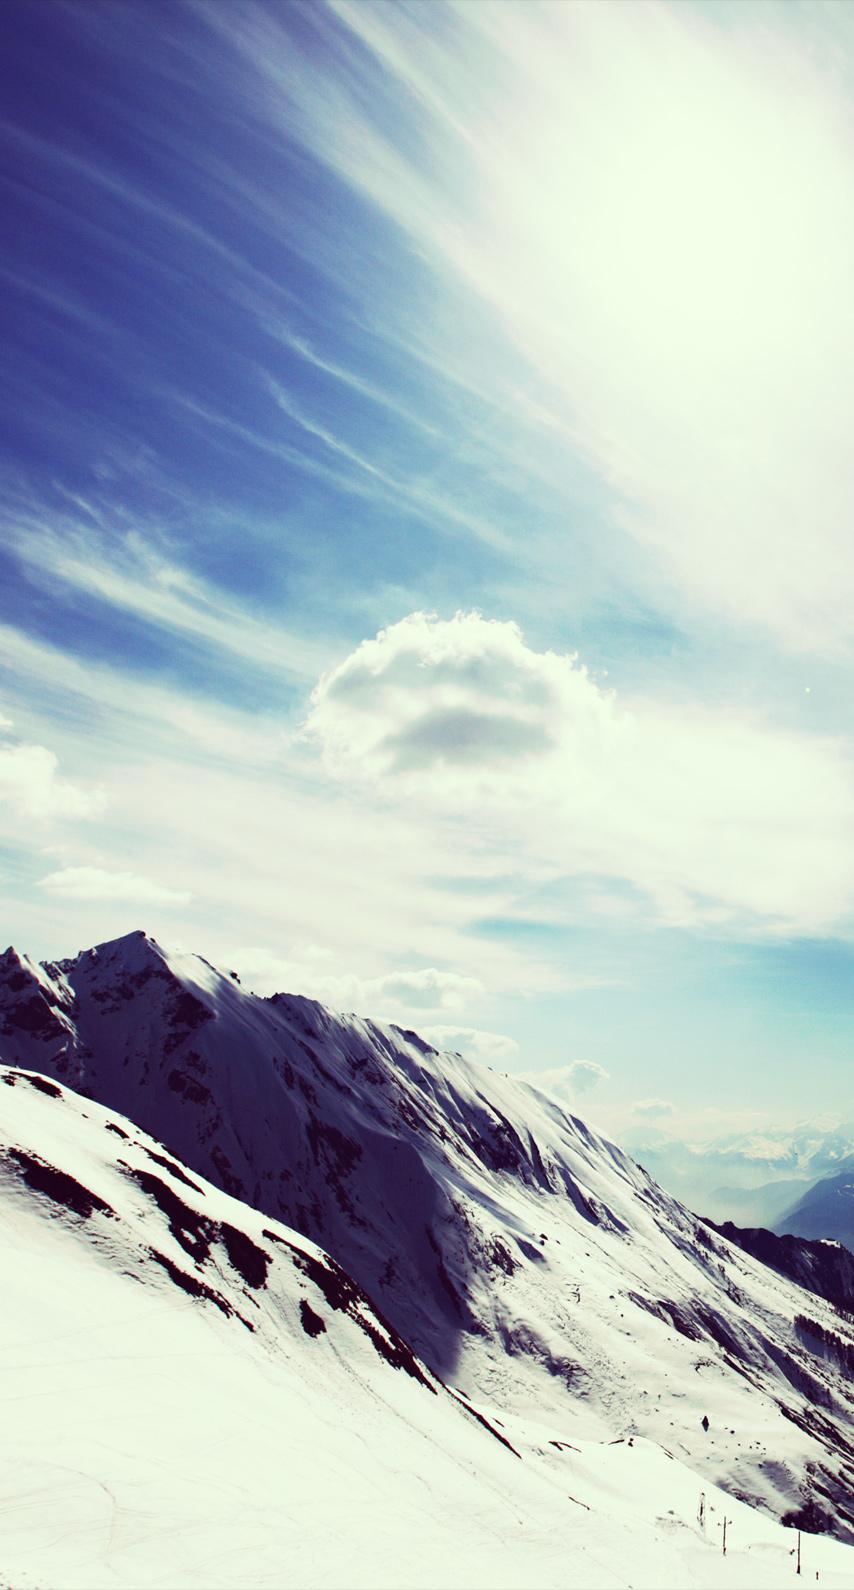 high, scenic